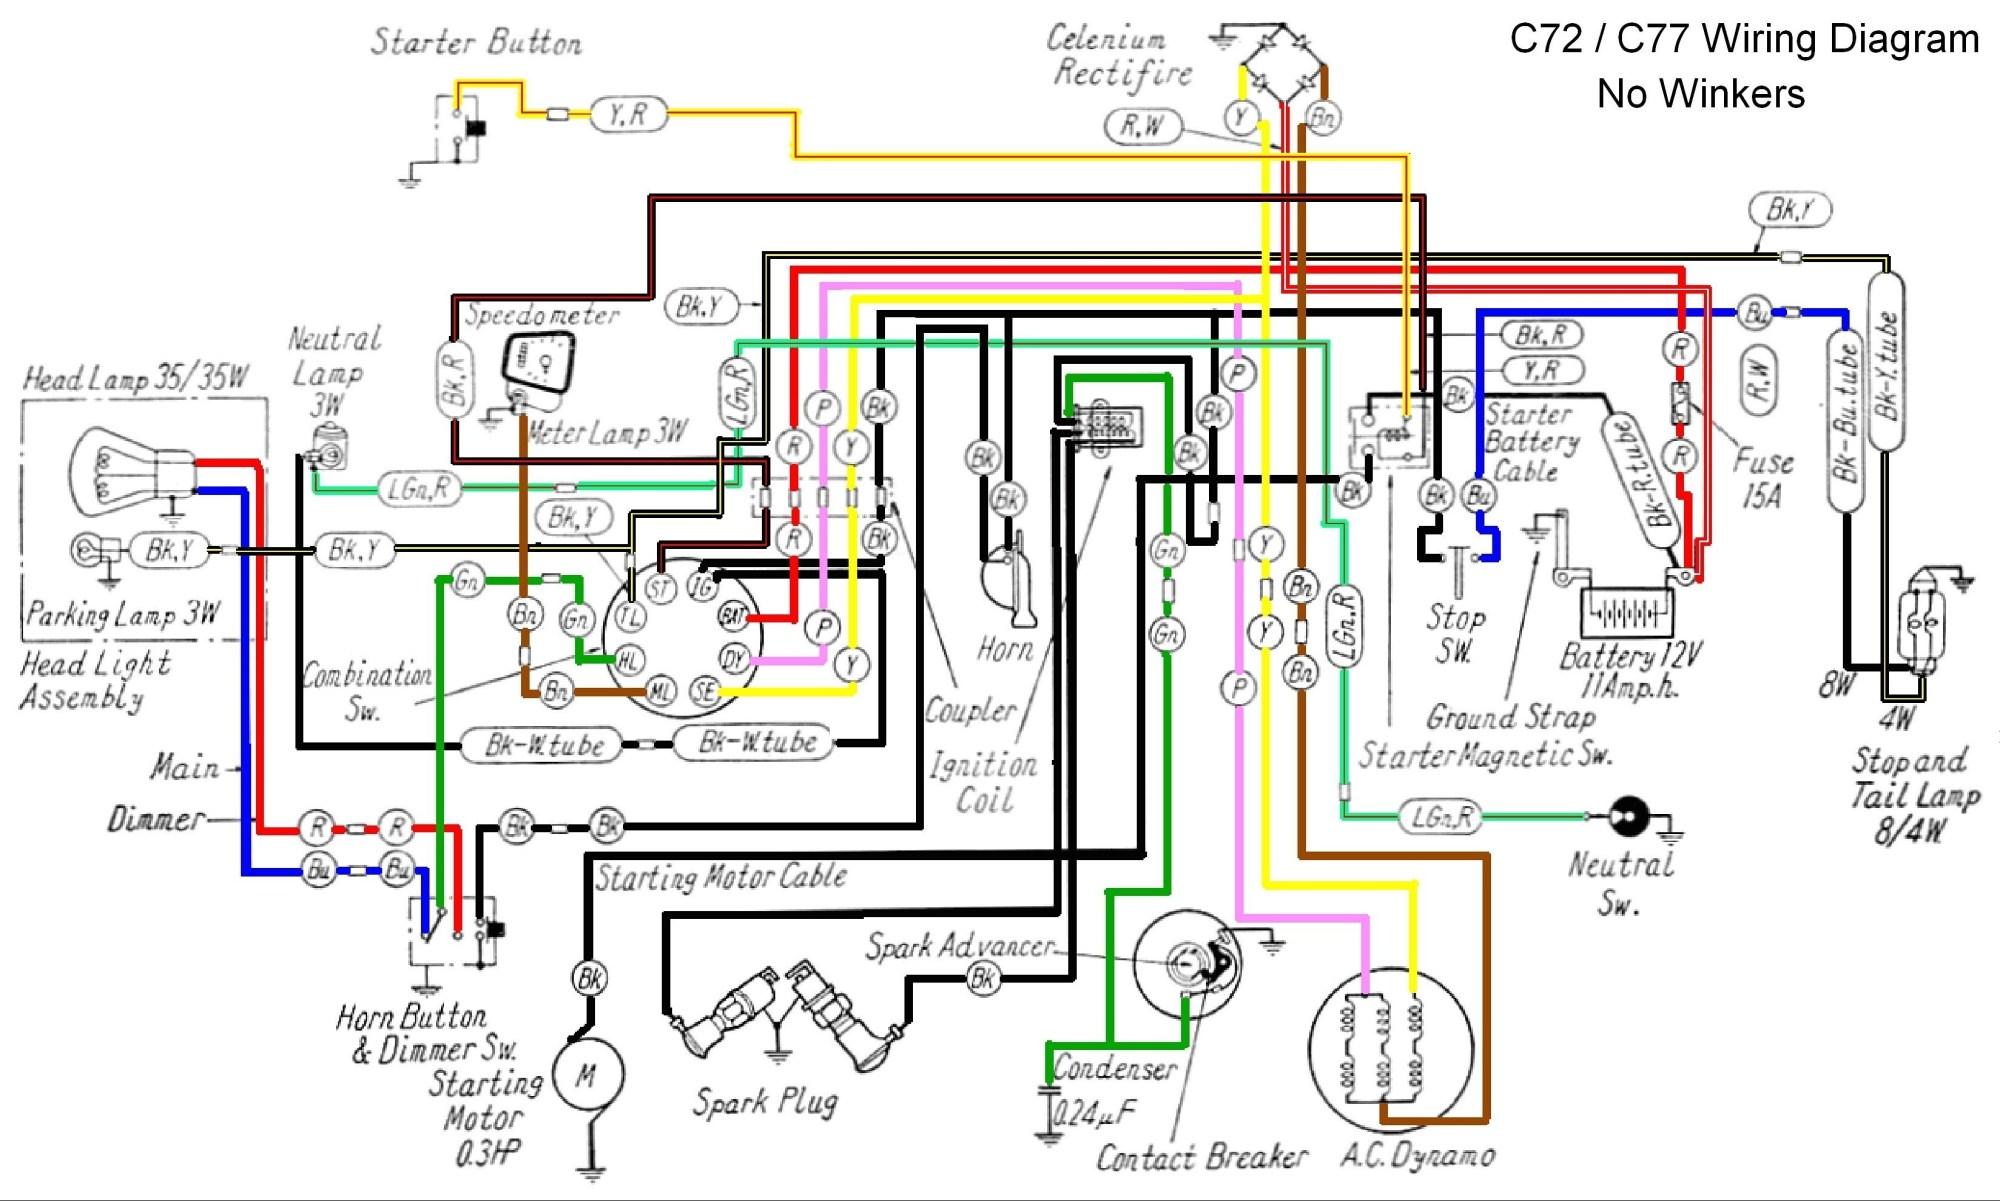 hight resolution of honda shadow aero wiring diagram wiring diagram for you2007 honda shadow aero wiring diagram share circuit